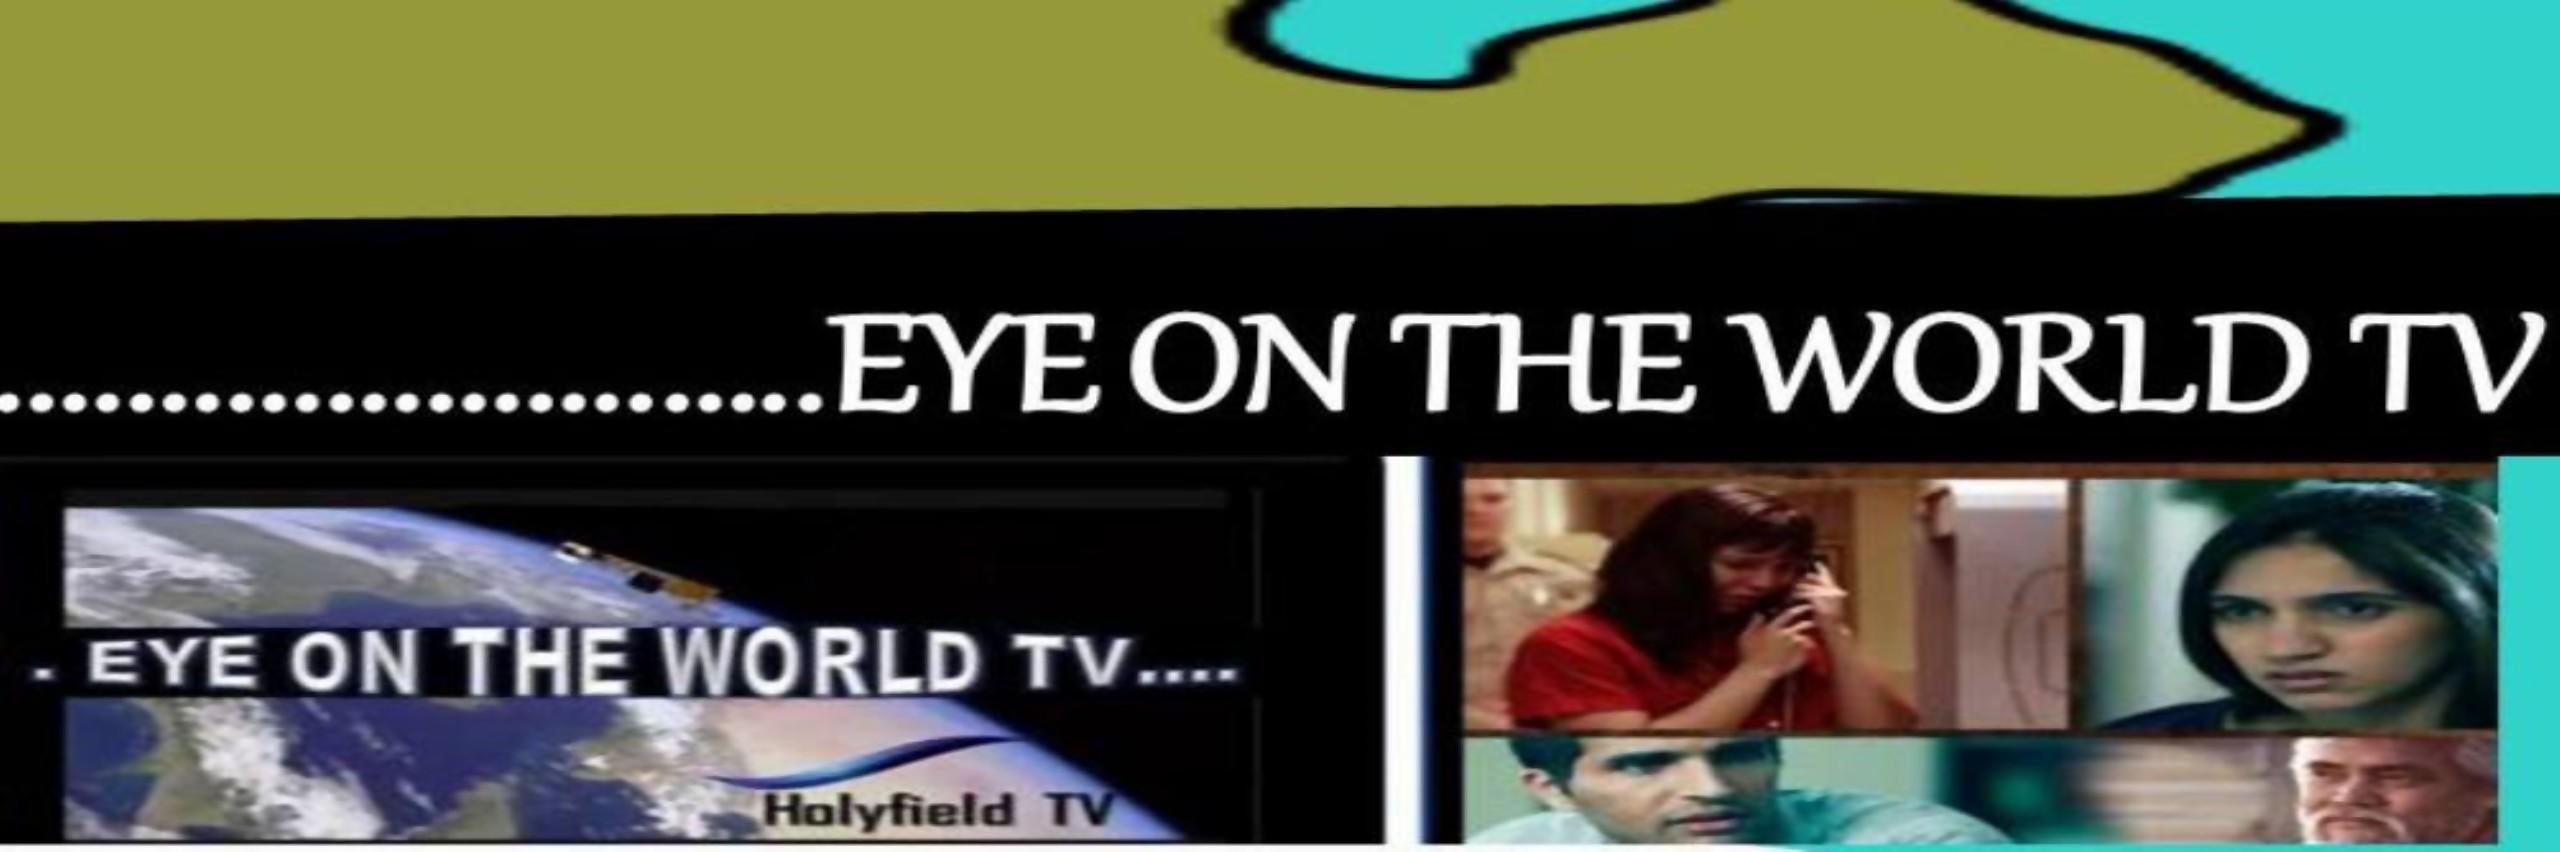 Eye On the World TV